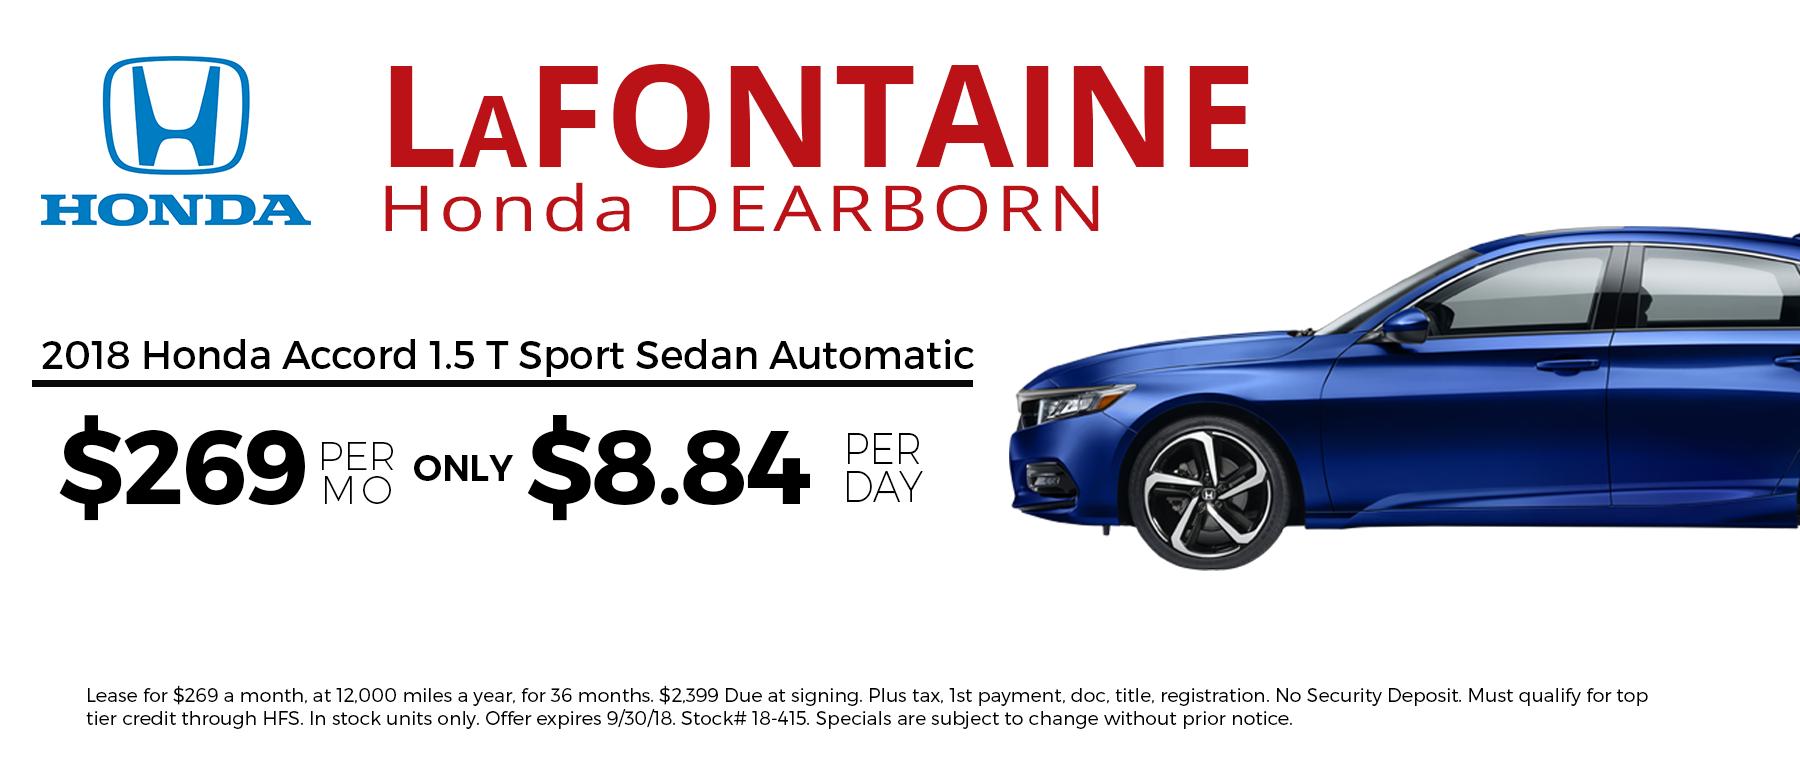 2018 Honda Accord 1.5 T Sport